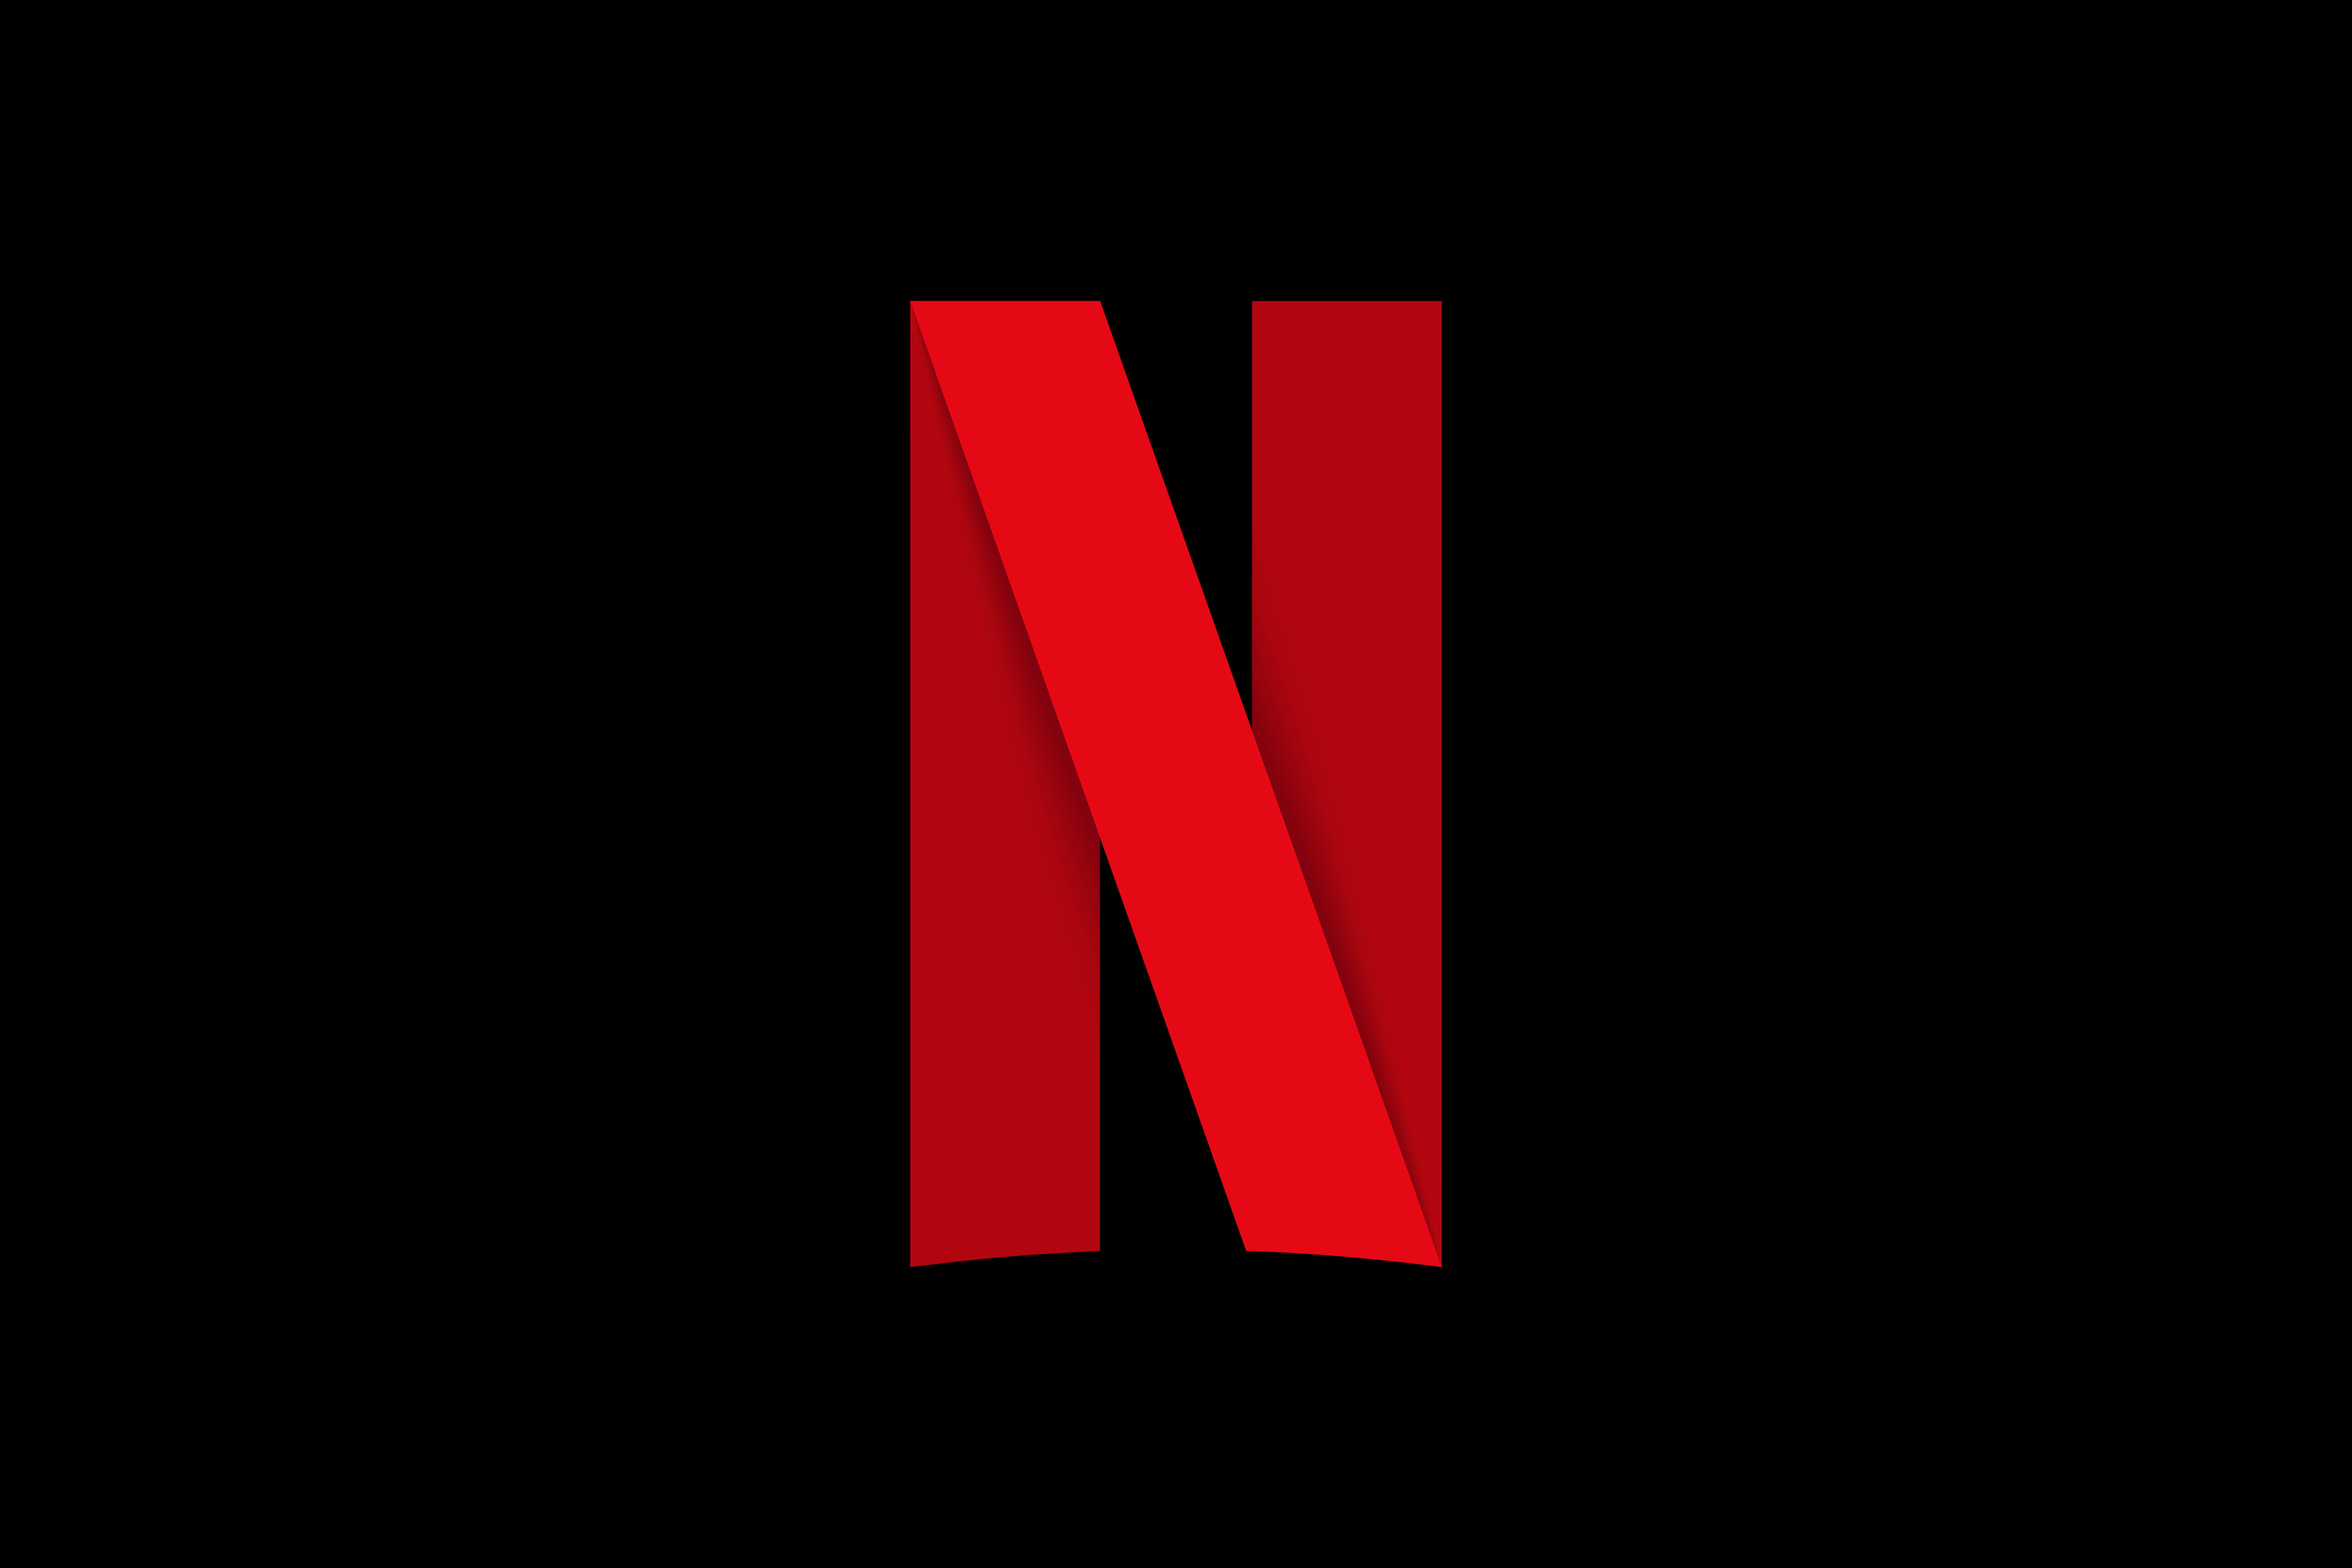 the Netflix logo, a big red N on a black background